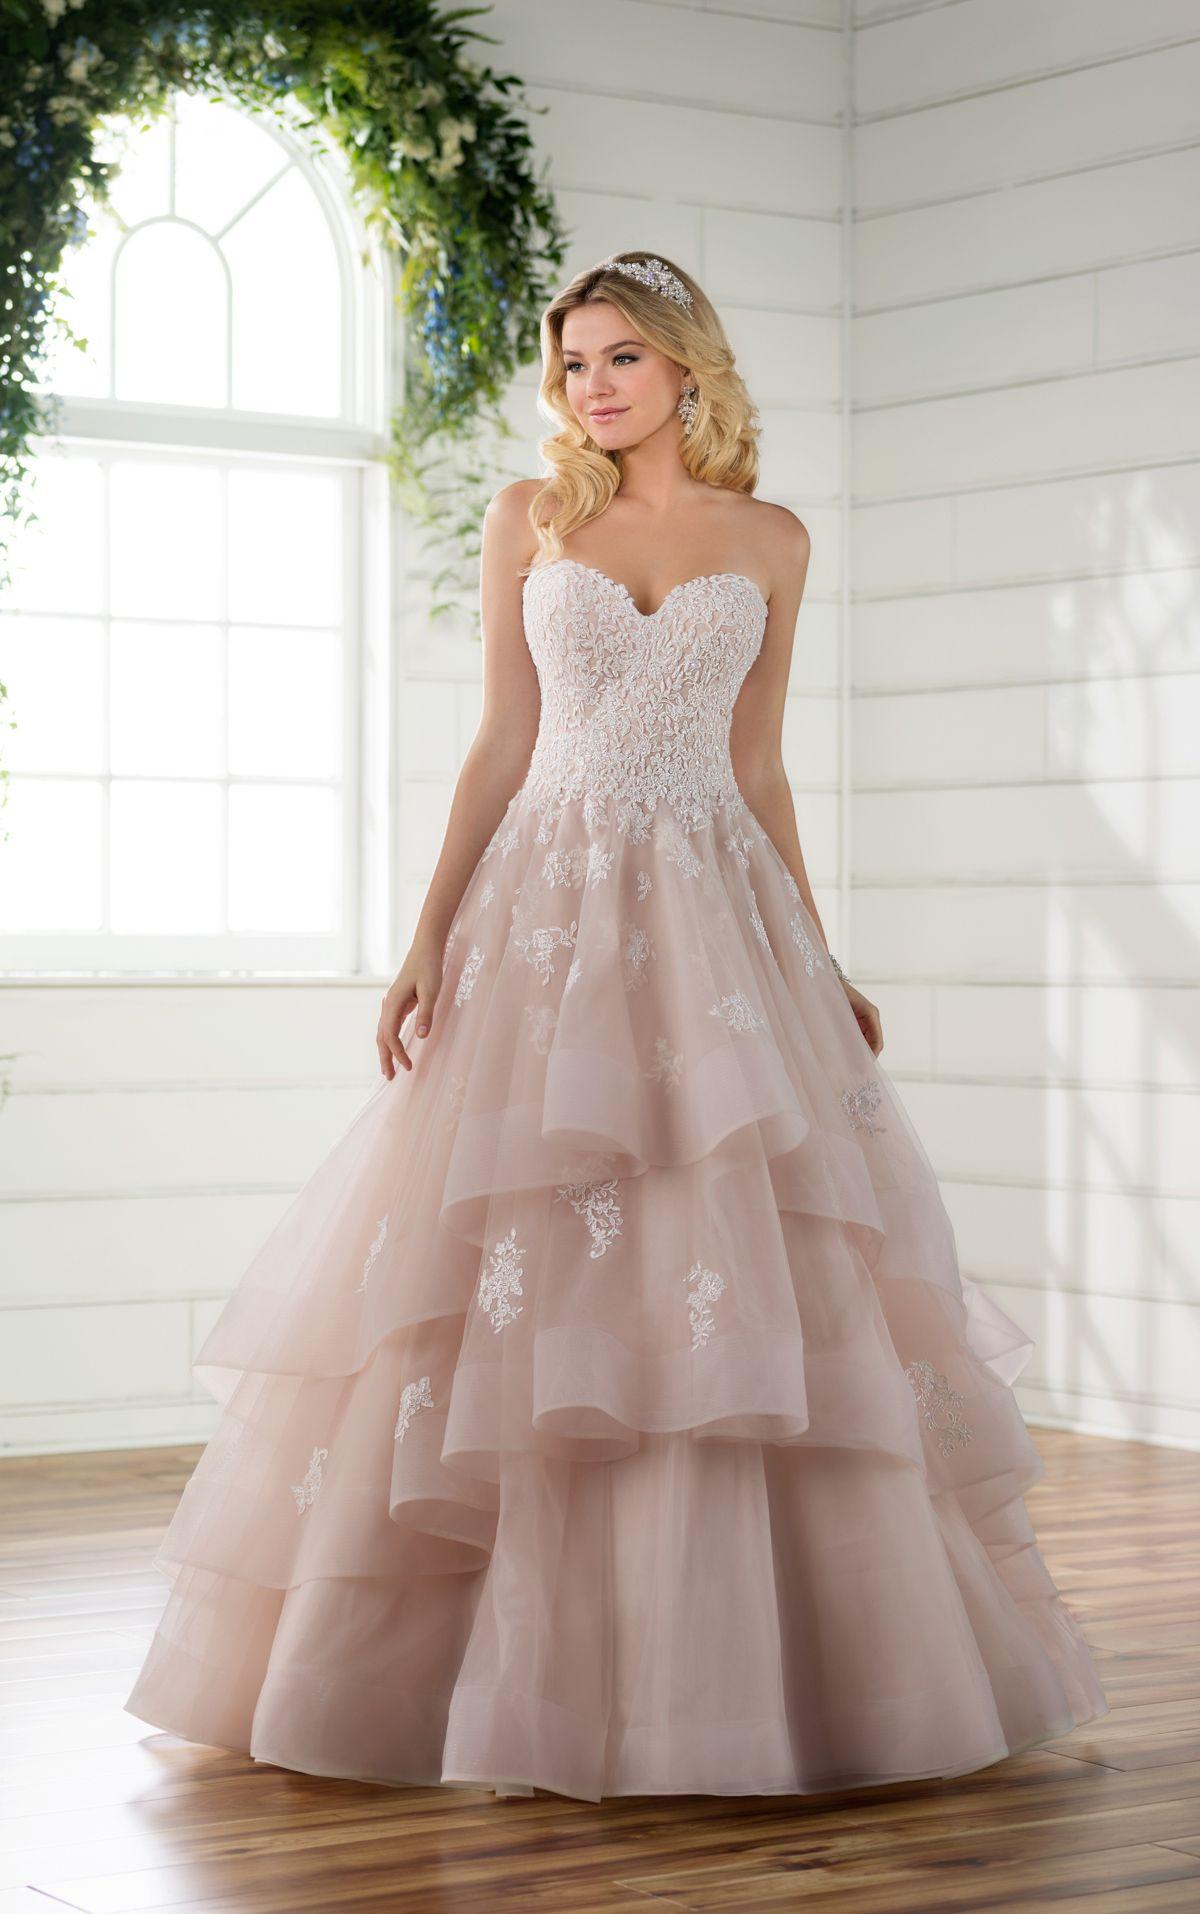 Essense wedding dress  Princess Wedding Dress with Lace and Tulle Skirt  Wedding Dresses